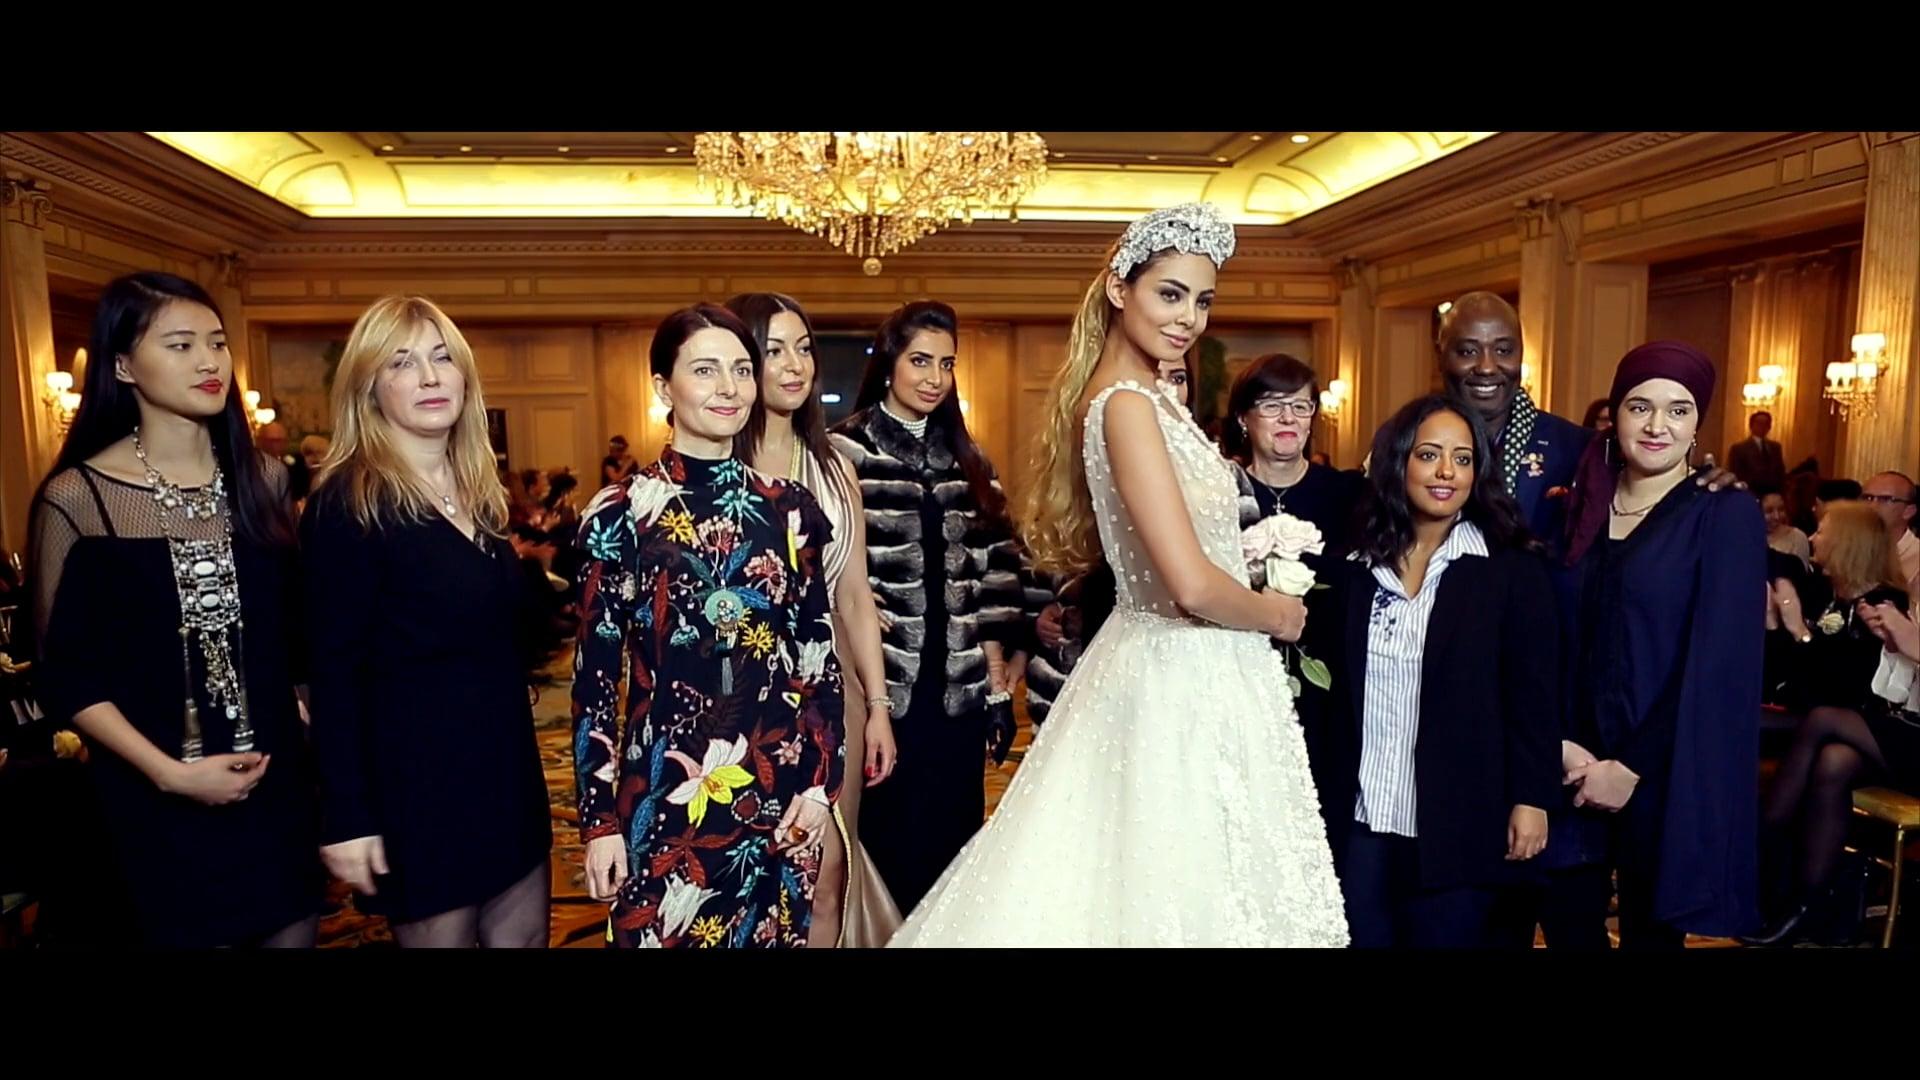 Fashion show / Sommet International de la Mode / DK Ambassador